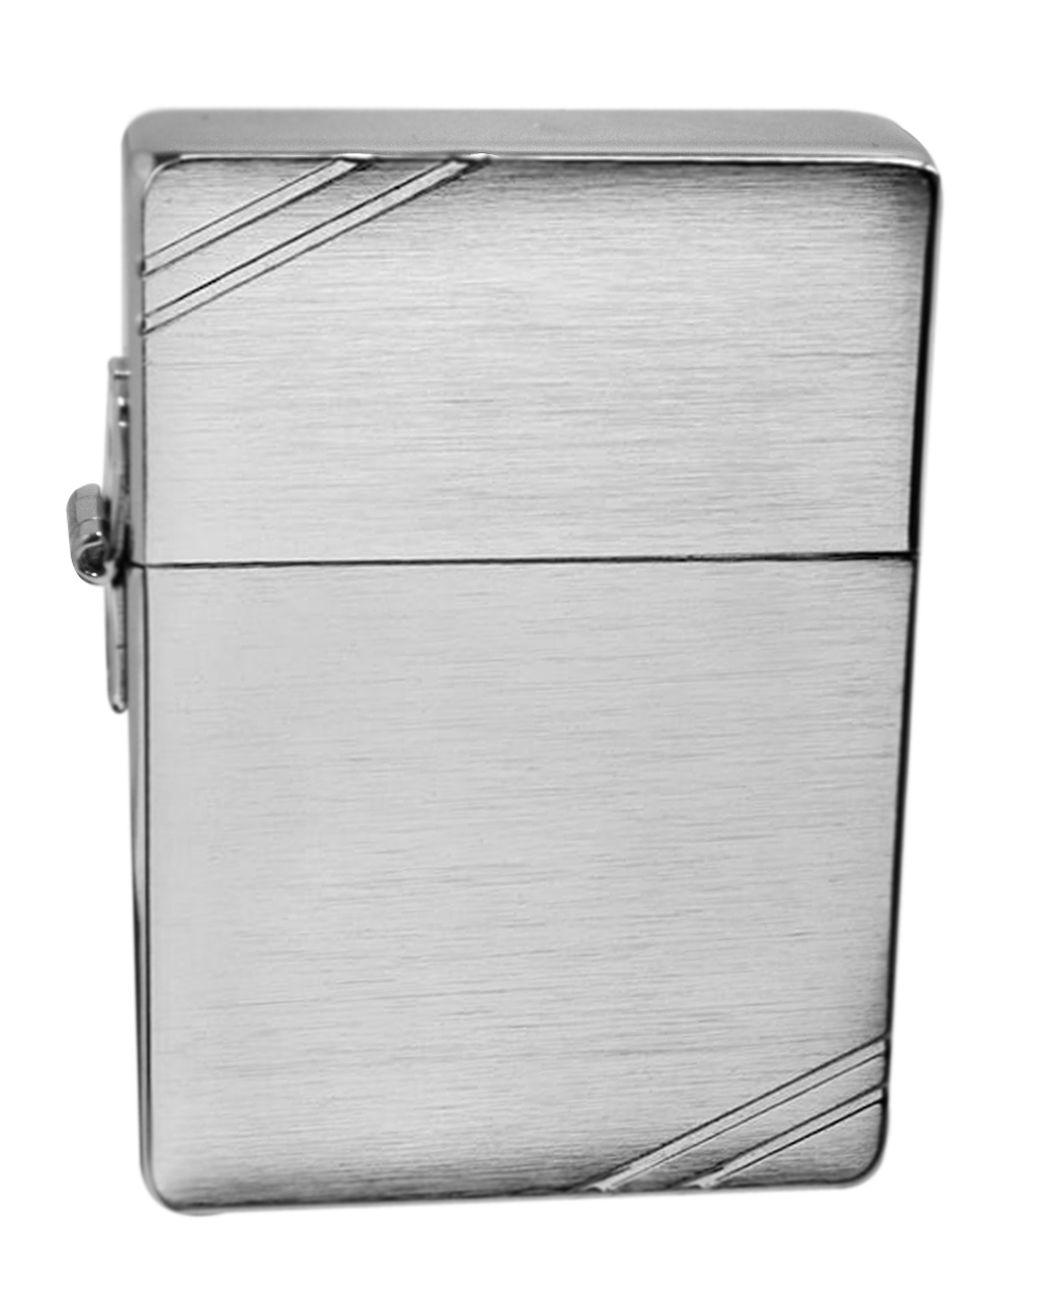 watch white zippo zippo lighter 1935 replica brushed chrome windproof